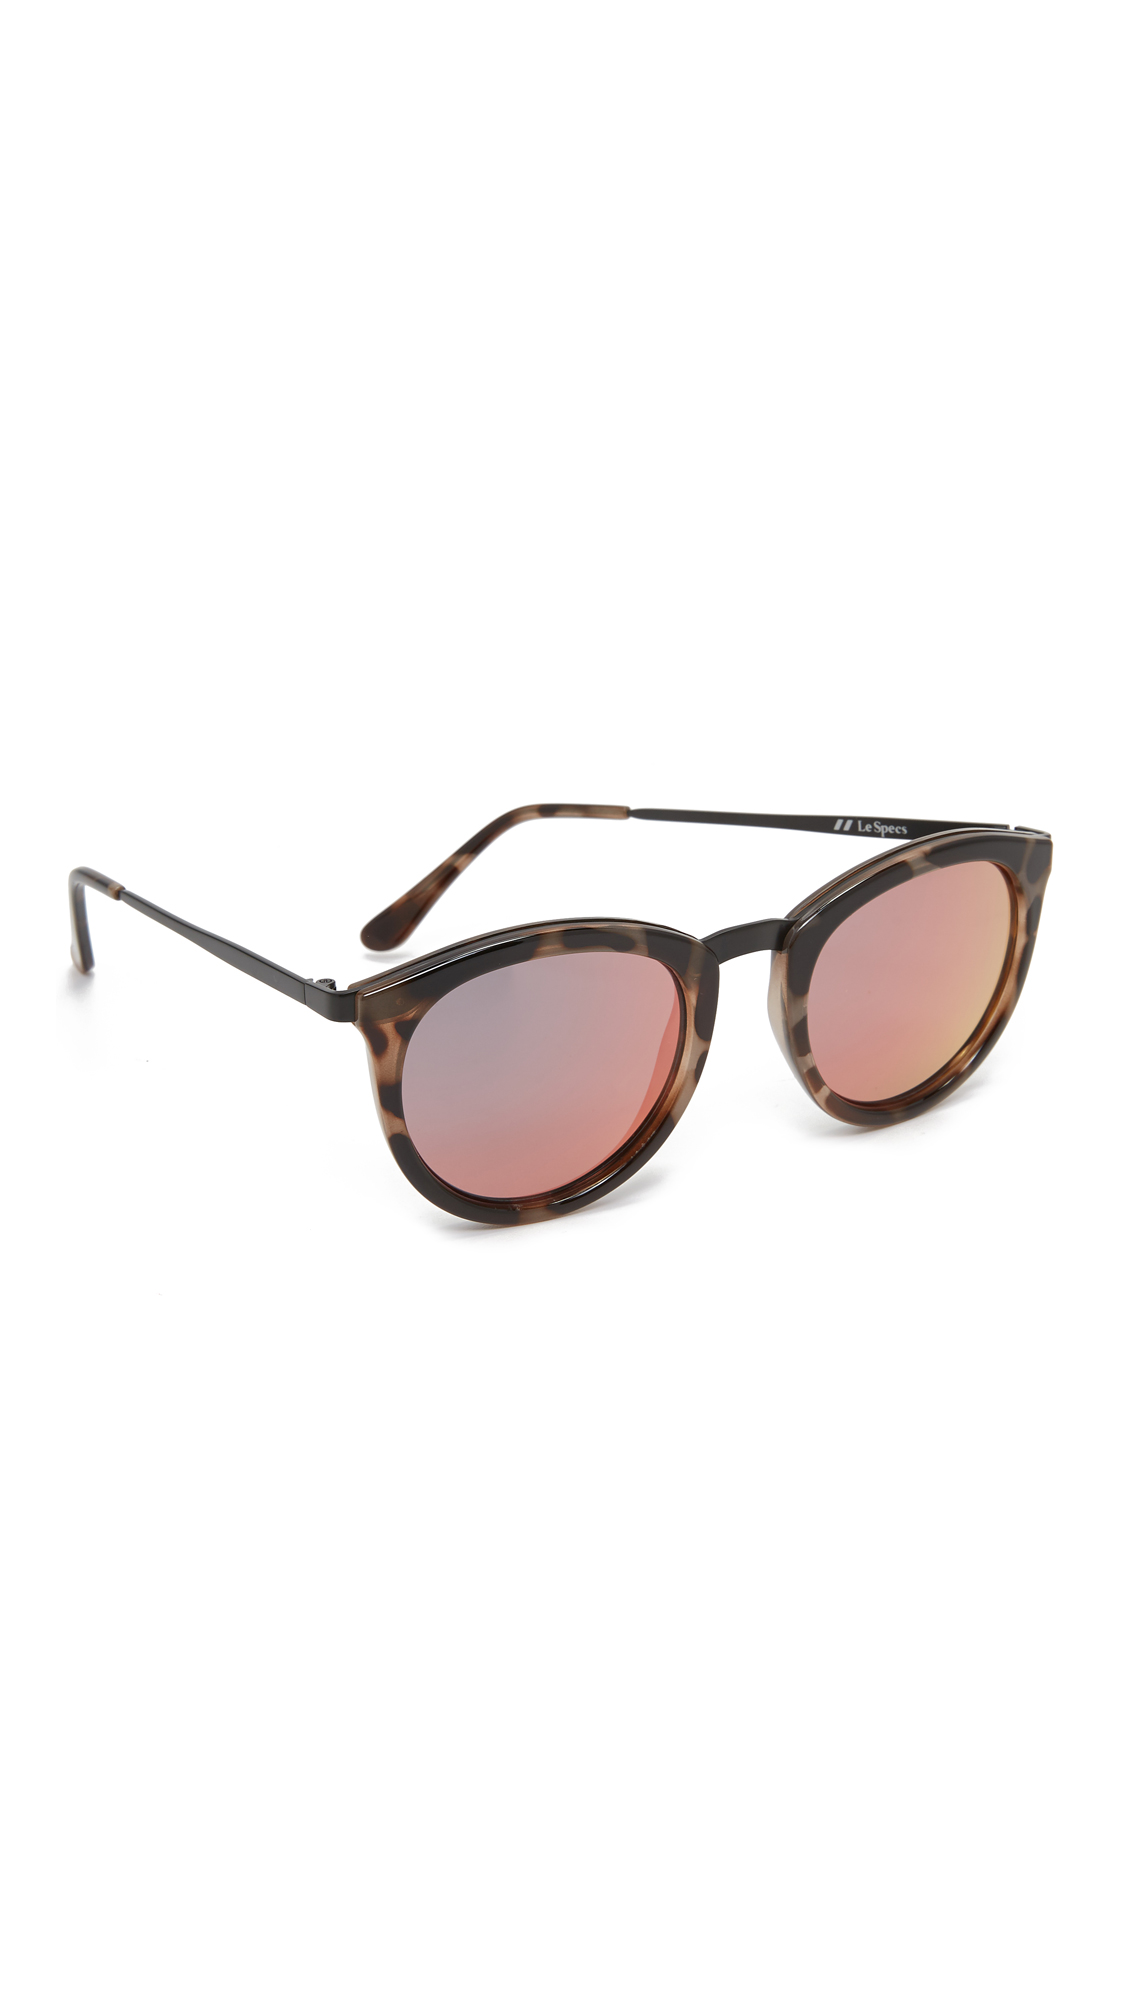 Le Specs No Smirking Sunglasses - Volcanic Tort/Coral Revo